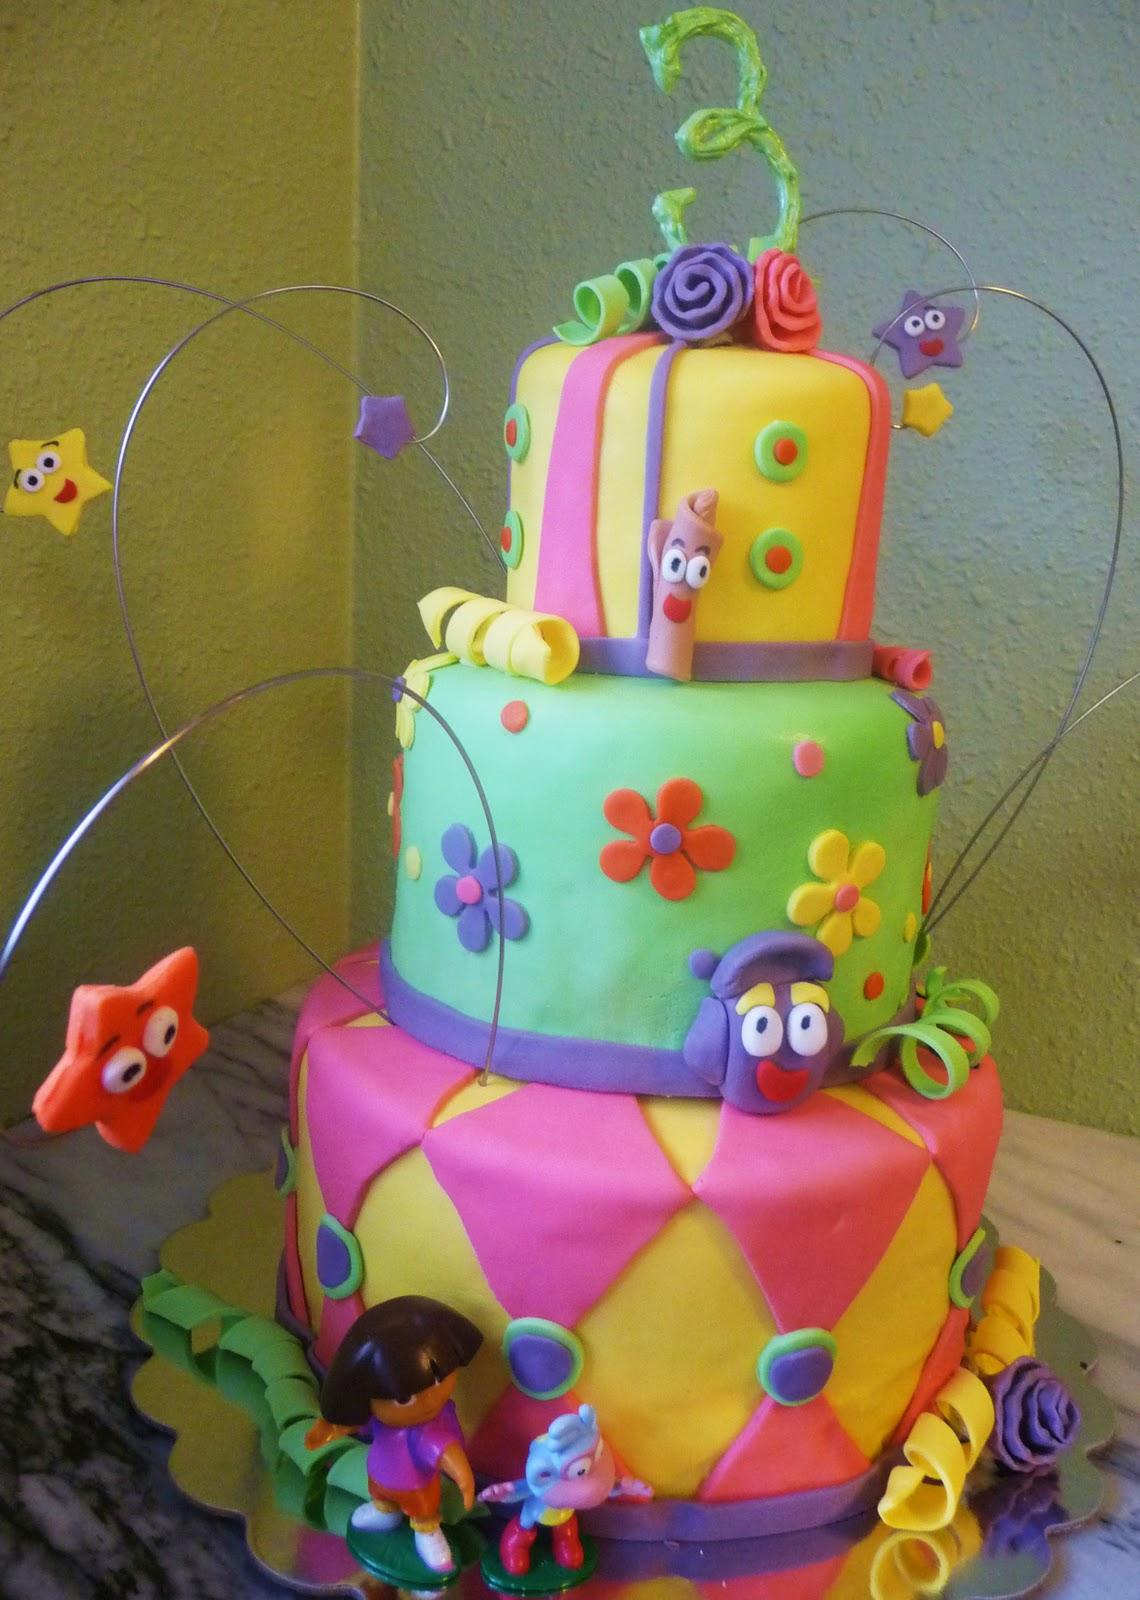 Pure Delights Baking Co Dora The Explorer Cake